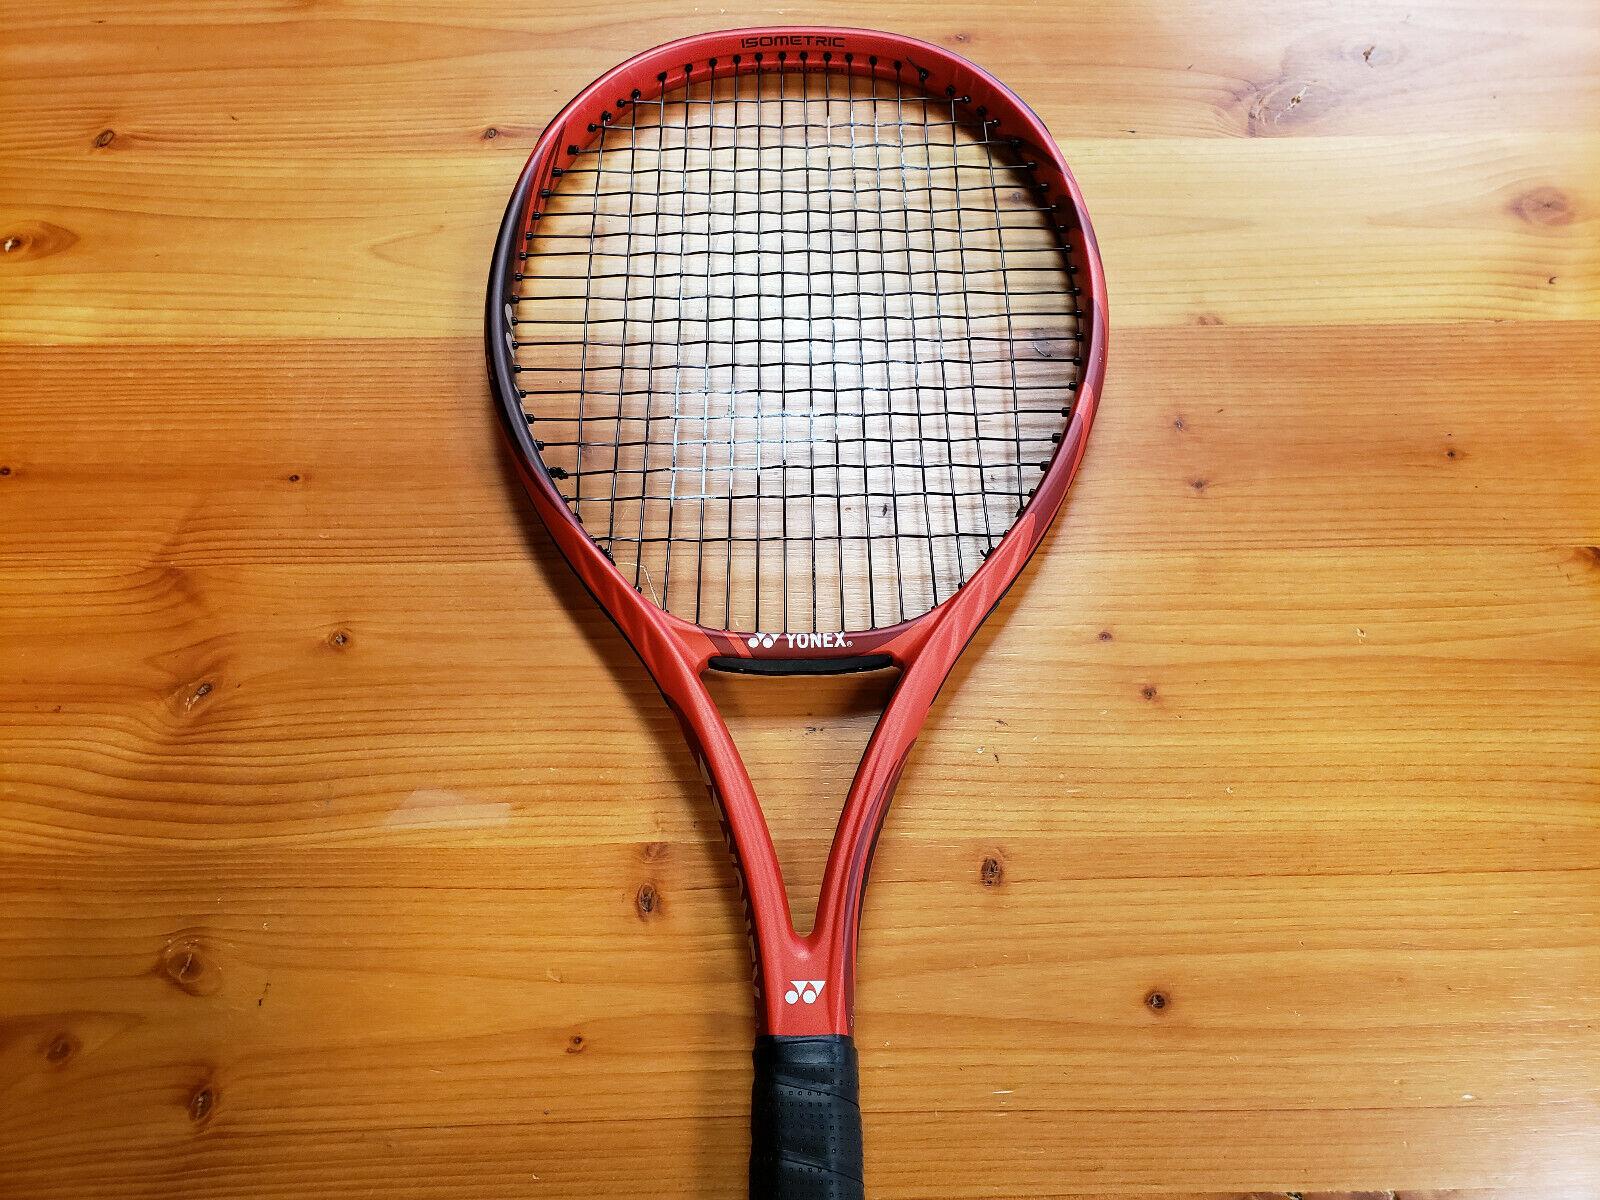 1f7654ce7 Yonex V-Core 100+ Preowned Tennis Racquet Grip SIze 4 1 4 4 4 32ed70 ...